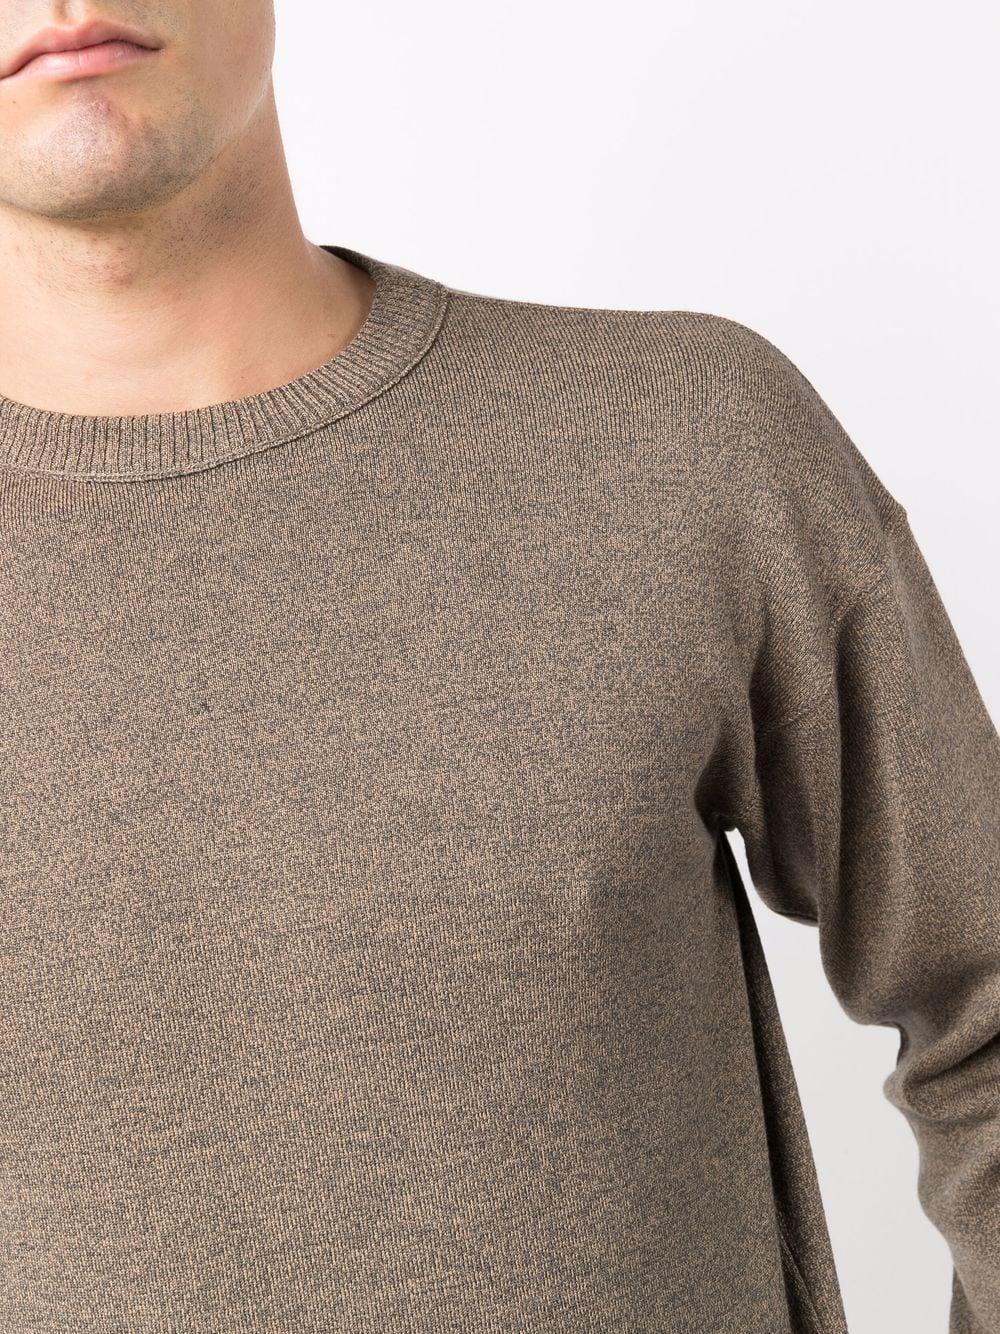 crewneck sweater man gray LEMAIRE | Sweaters | M 213 KN320 LK087.130